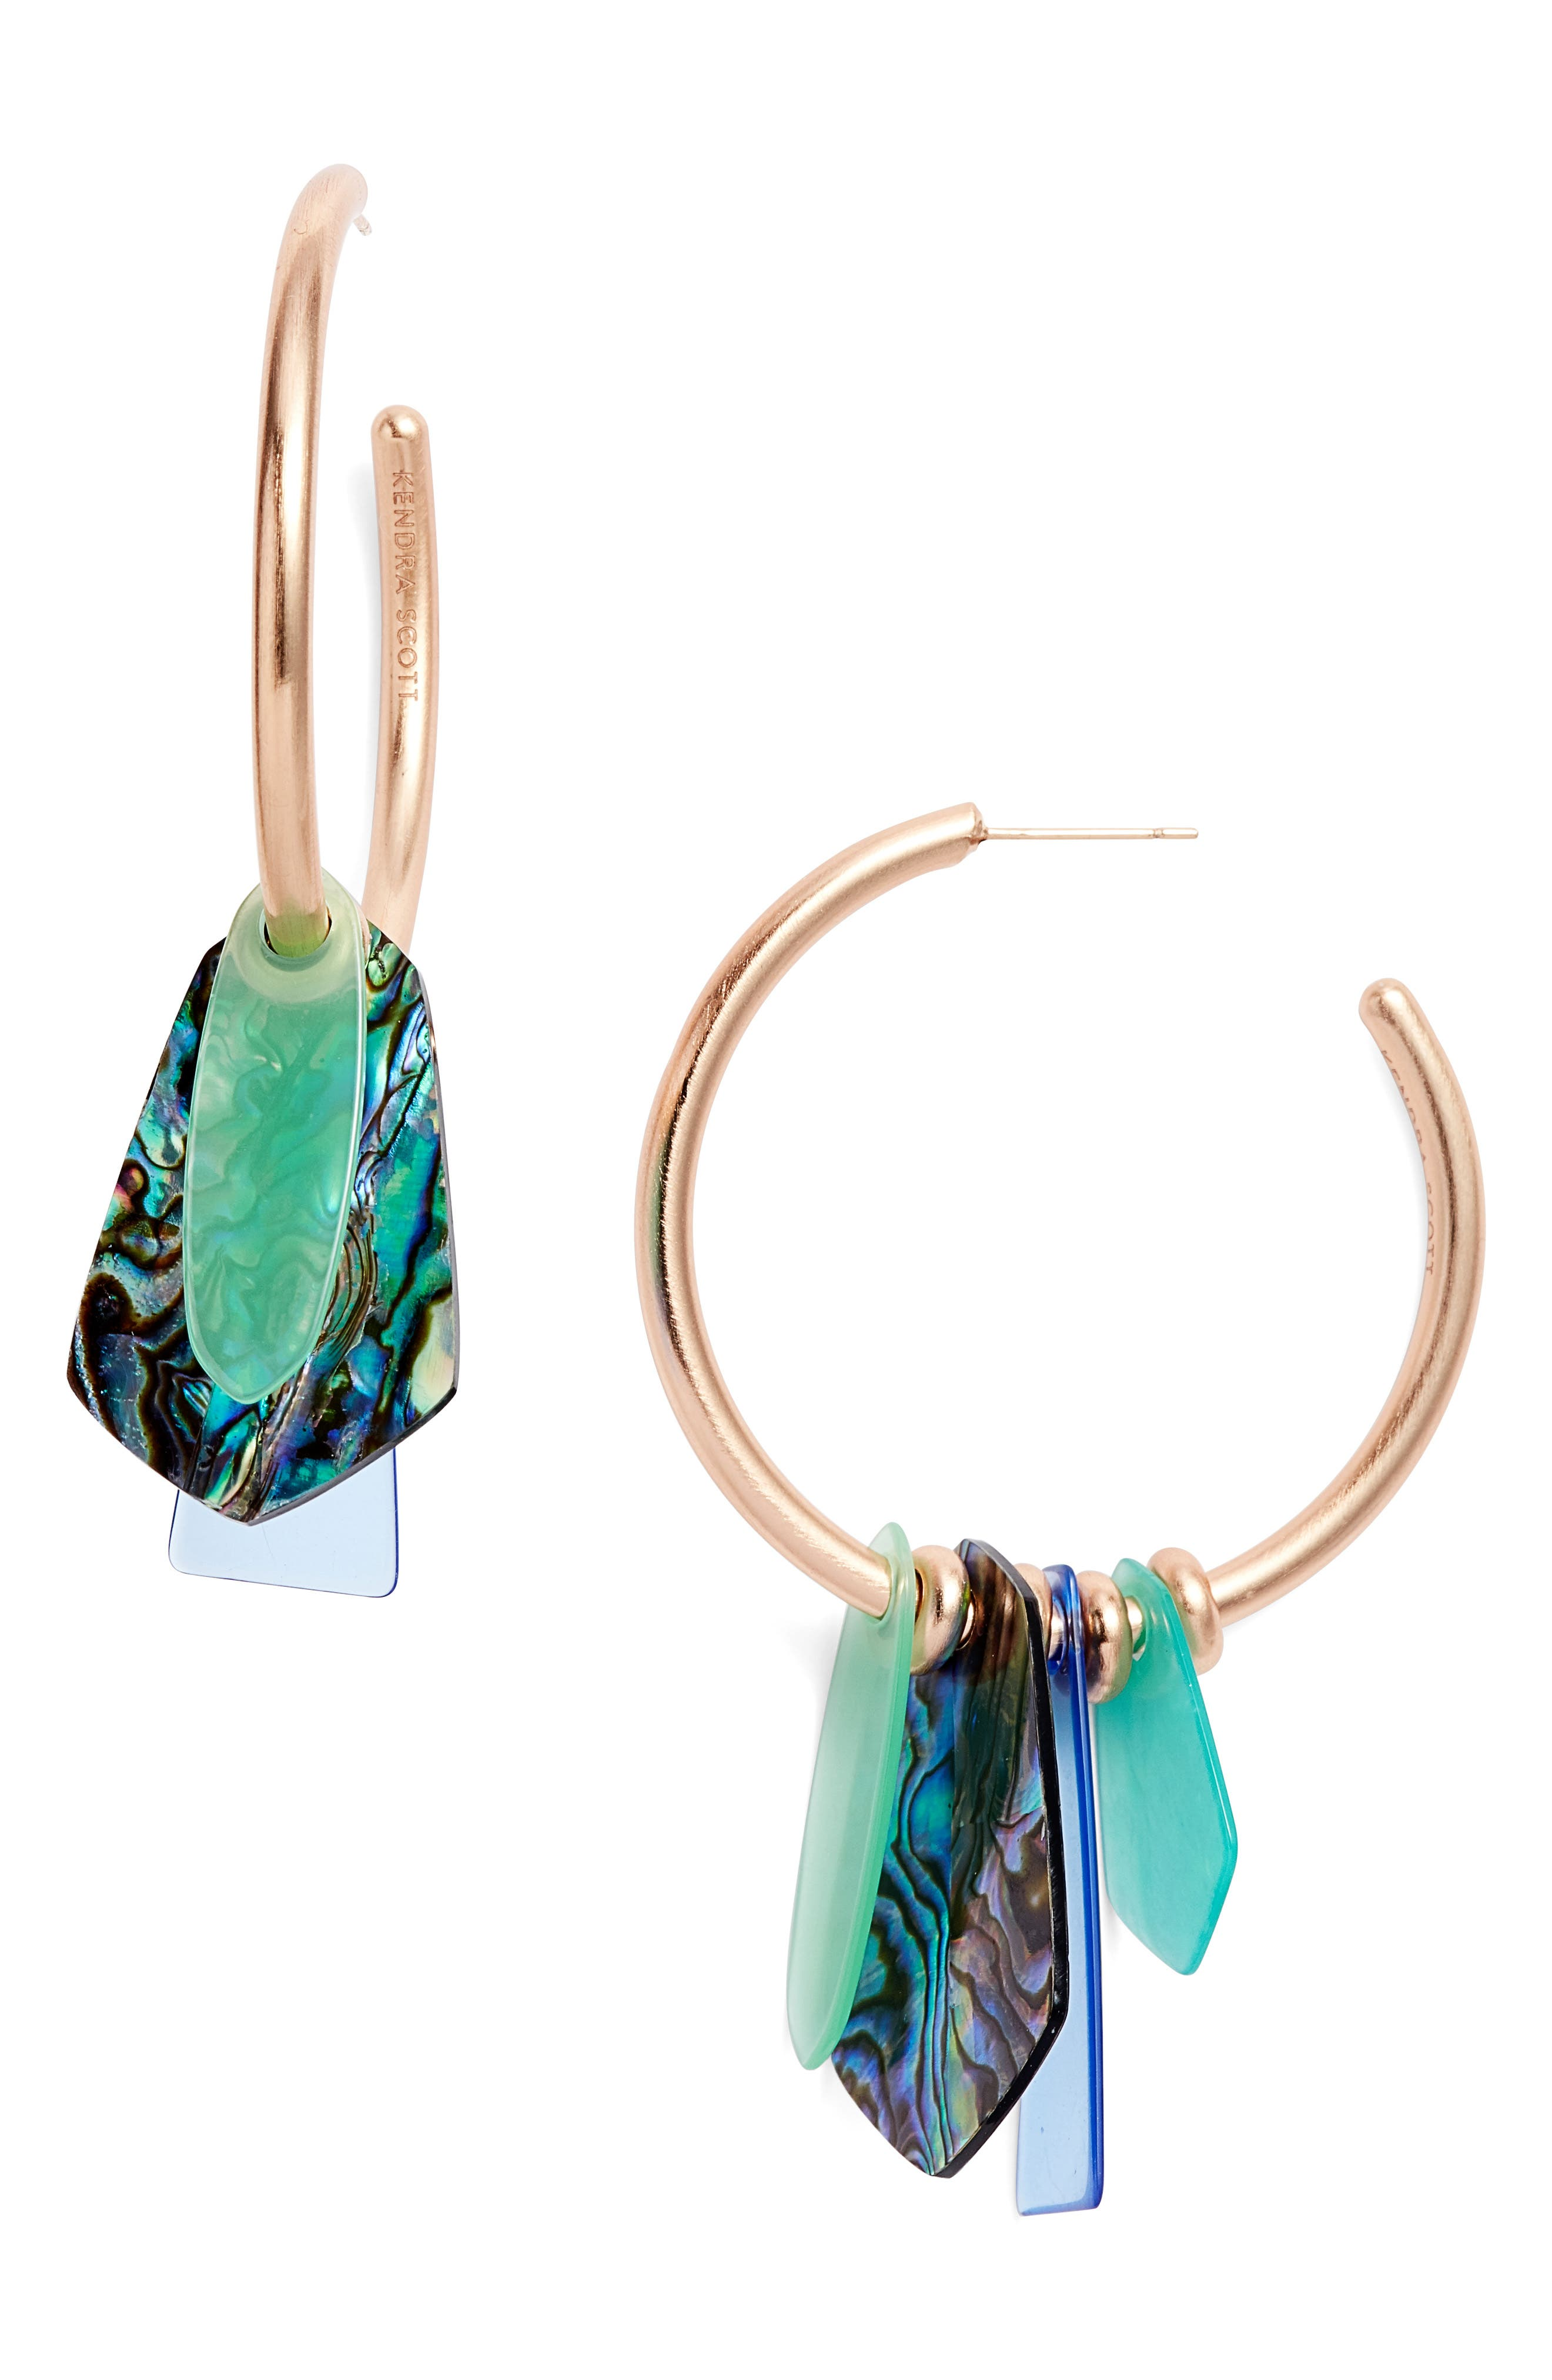 KENDRA SCOTT Gaby Hoop Earrings, Main, color, ABALONE MIX/ ROSE GOLD